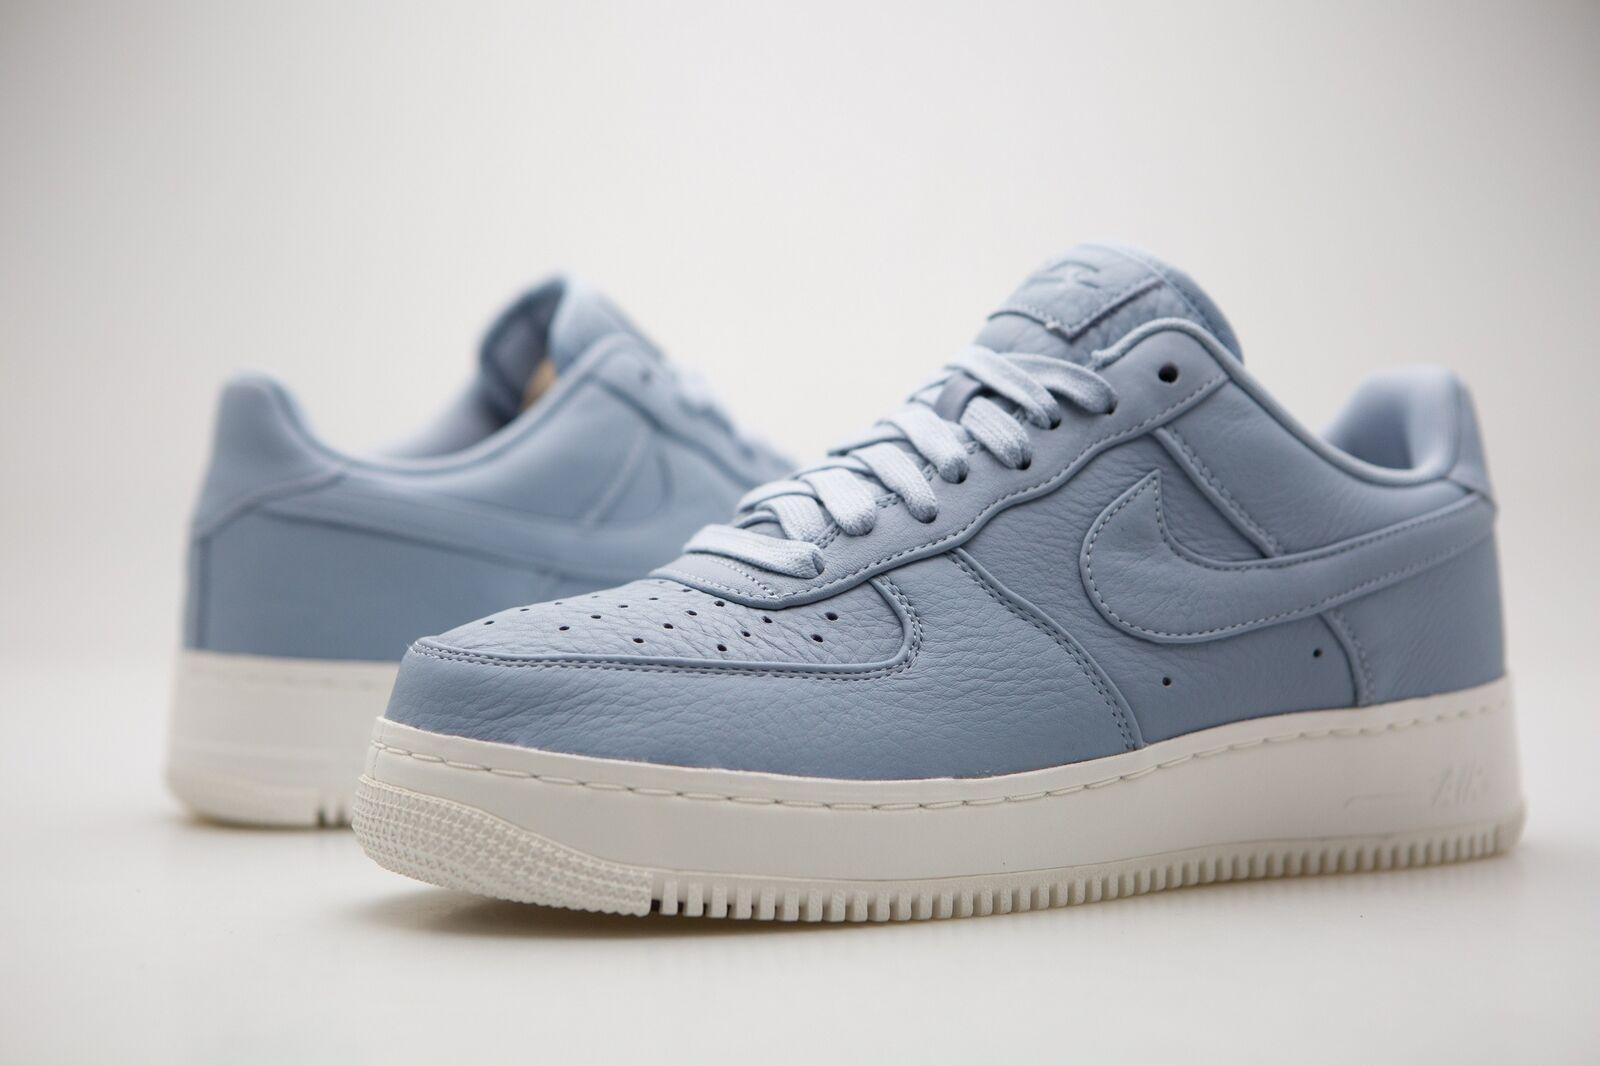 905618-400 Nike uomo Nikelab Air Force 1 Low Blue Grey Sail Scarpe classiche da uomo